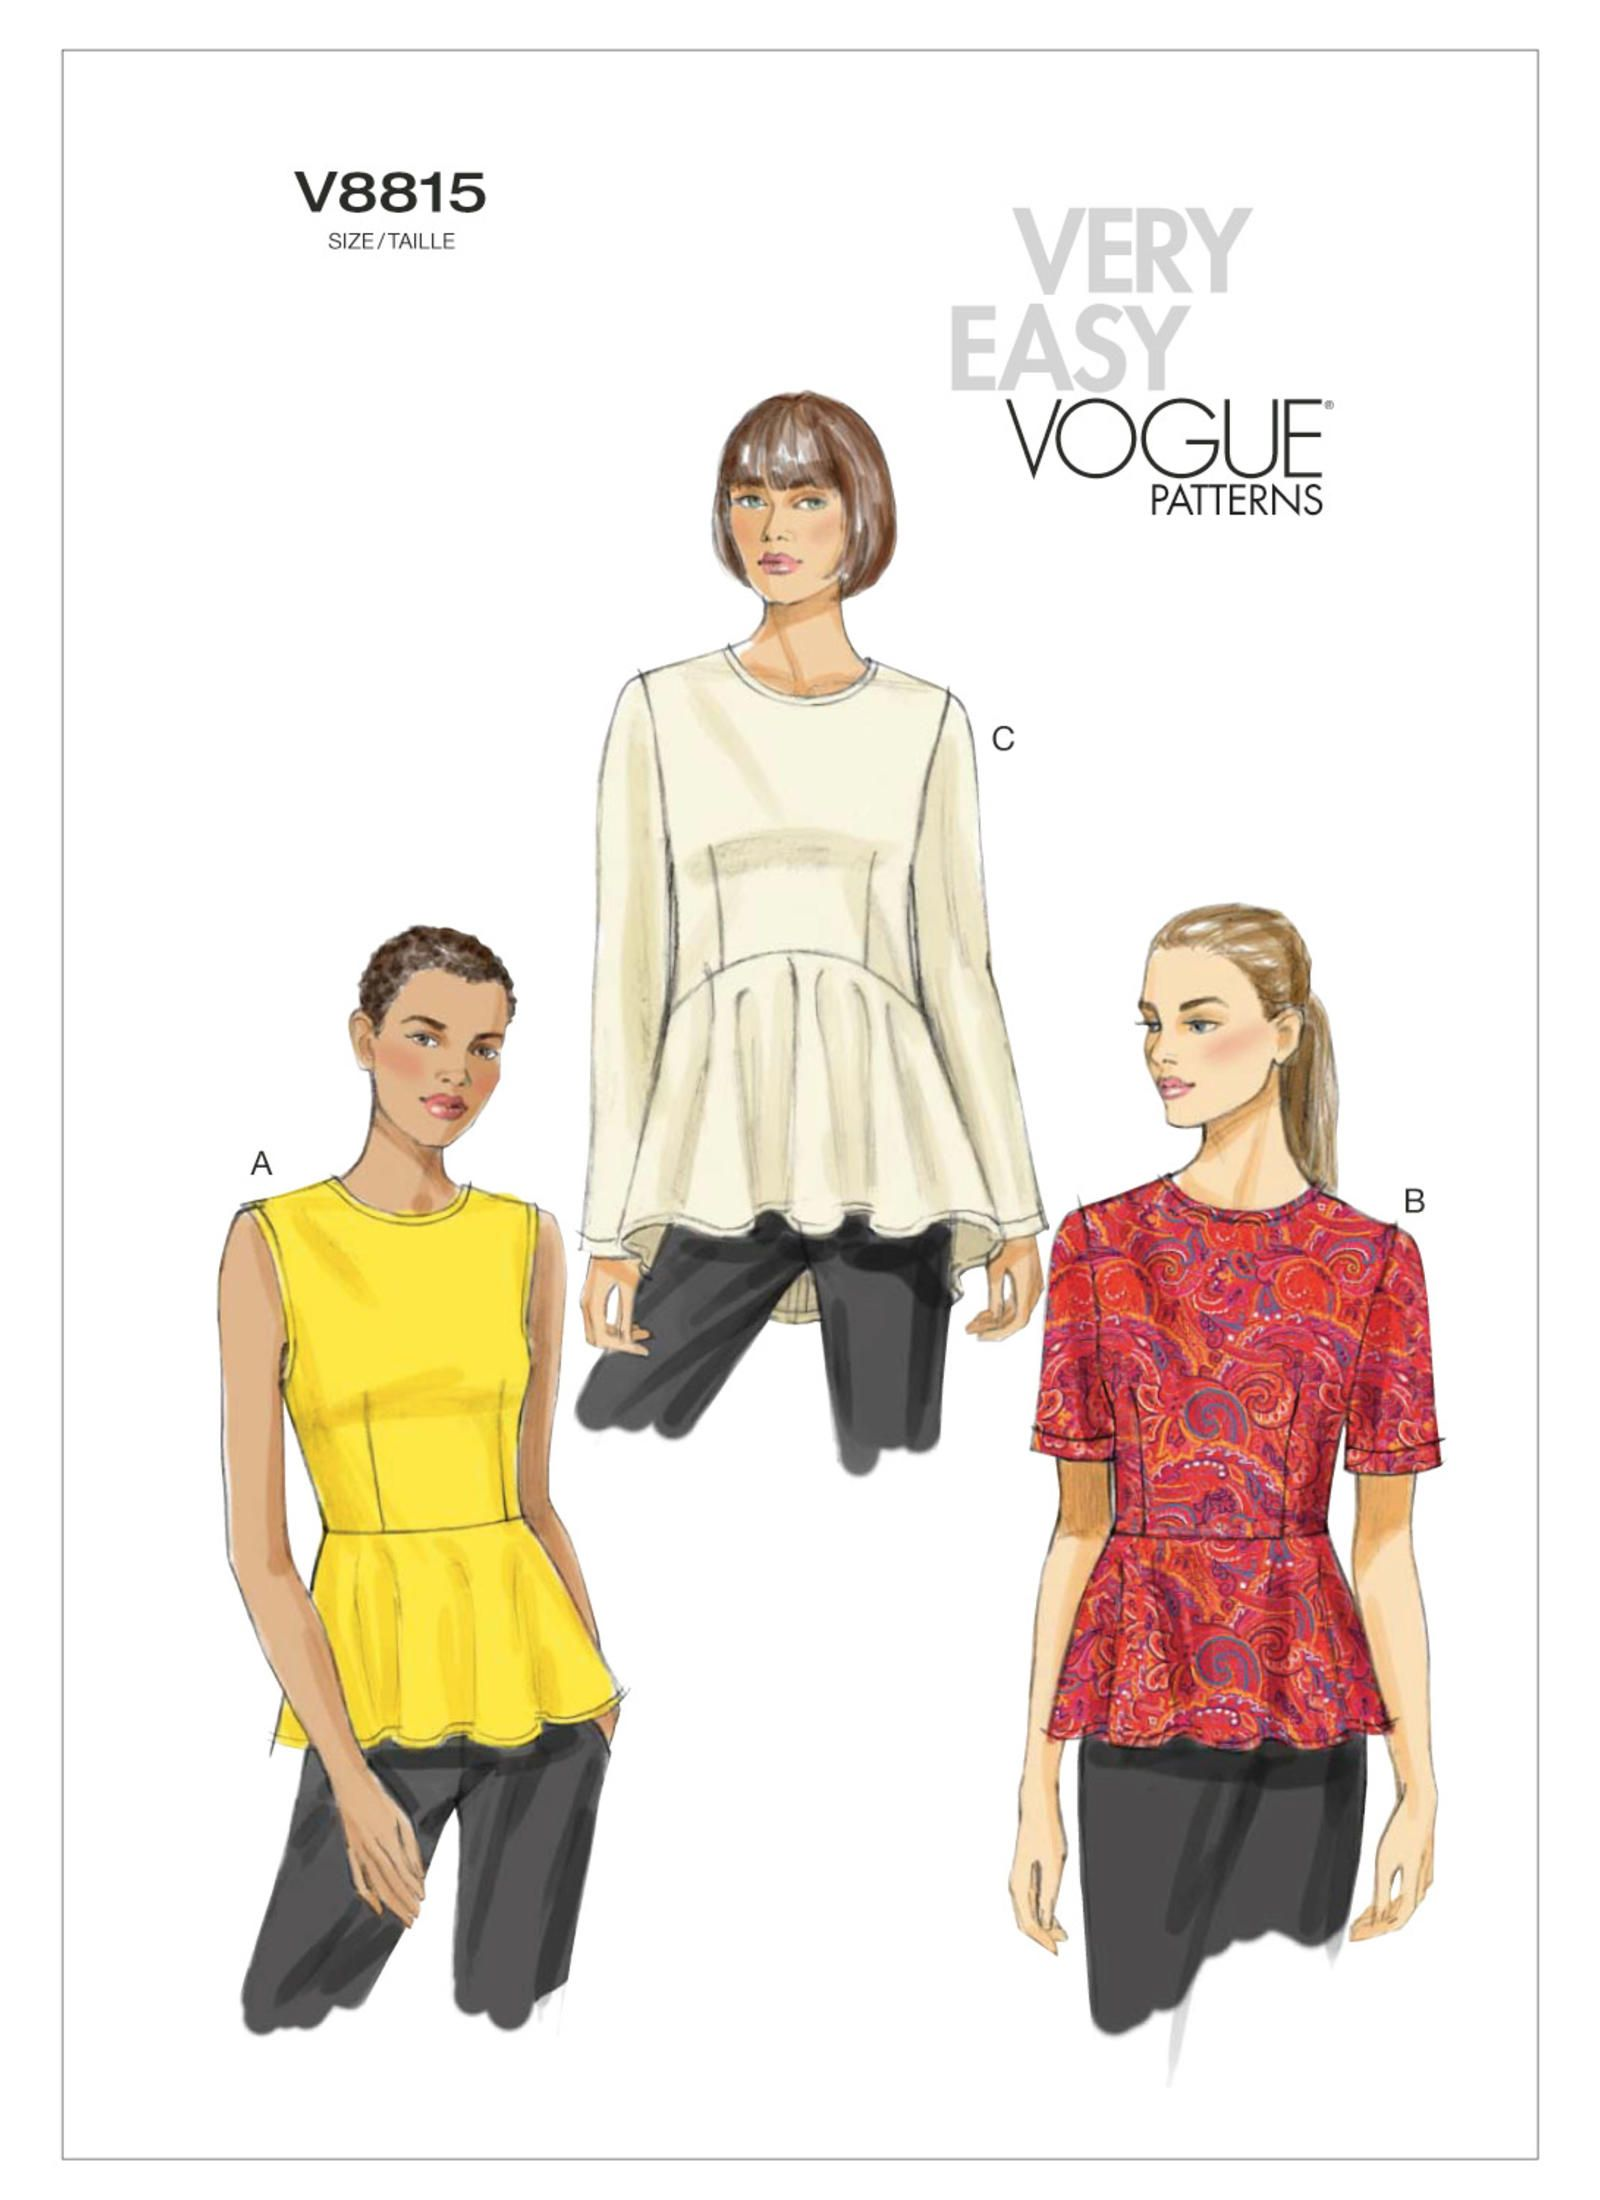 V8815 | Vogue Patterns | Sewing Patterns - Vogue to Buy | Pinterest